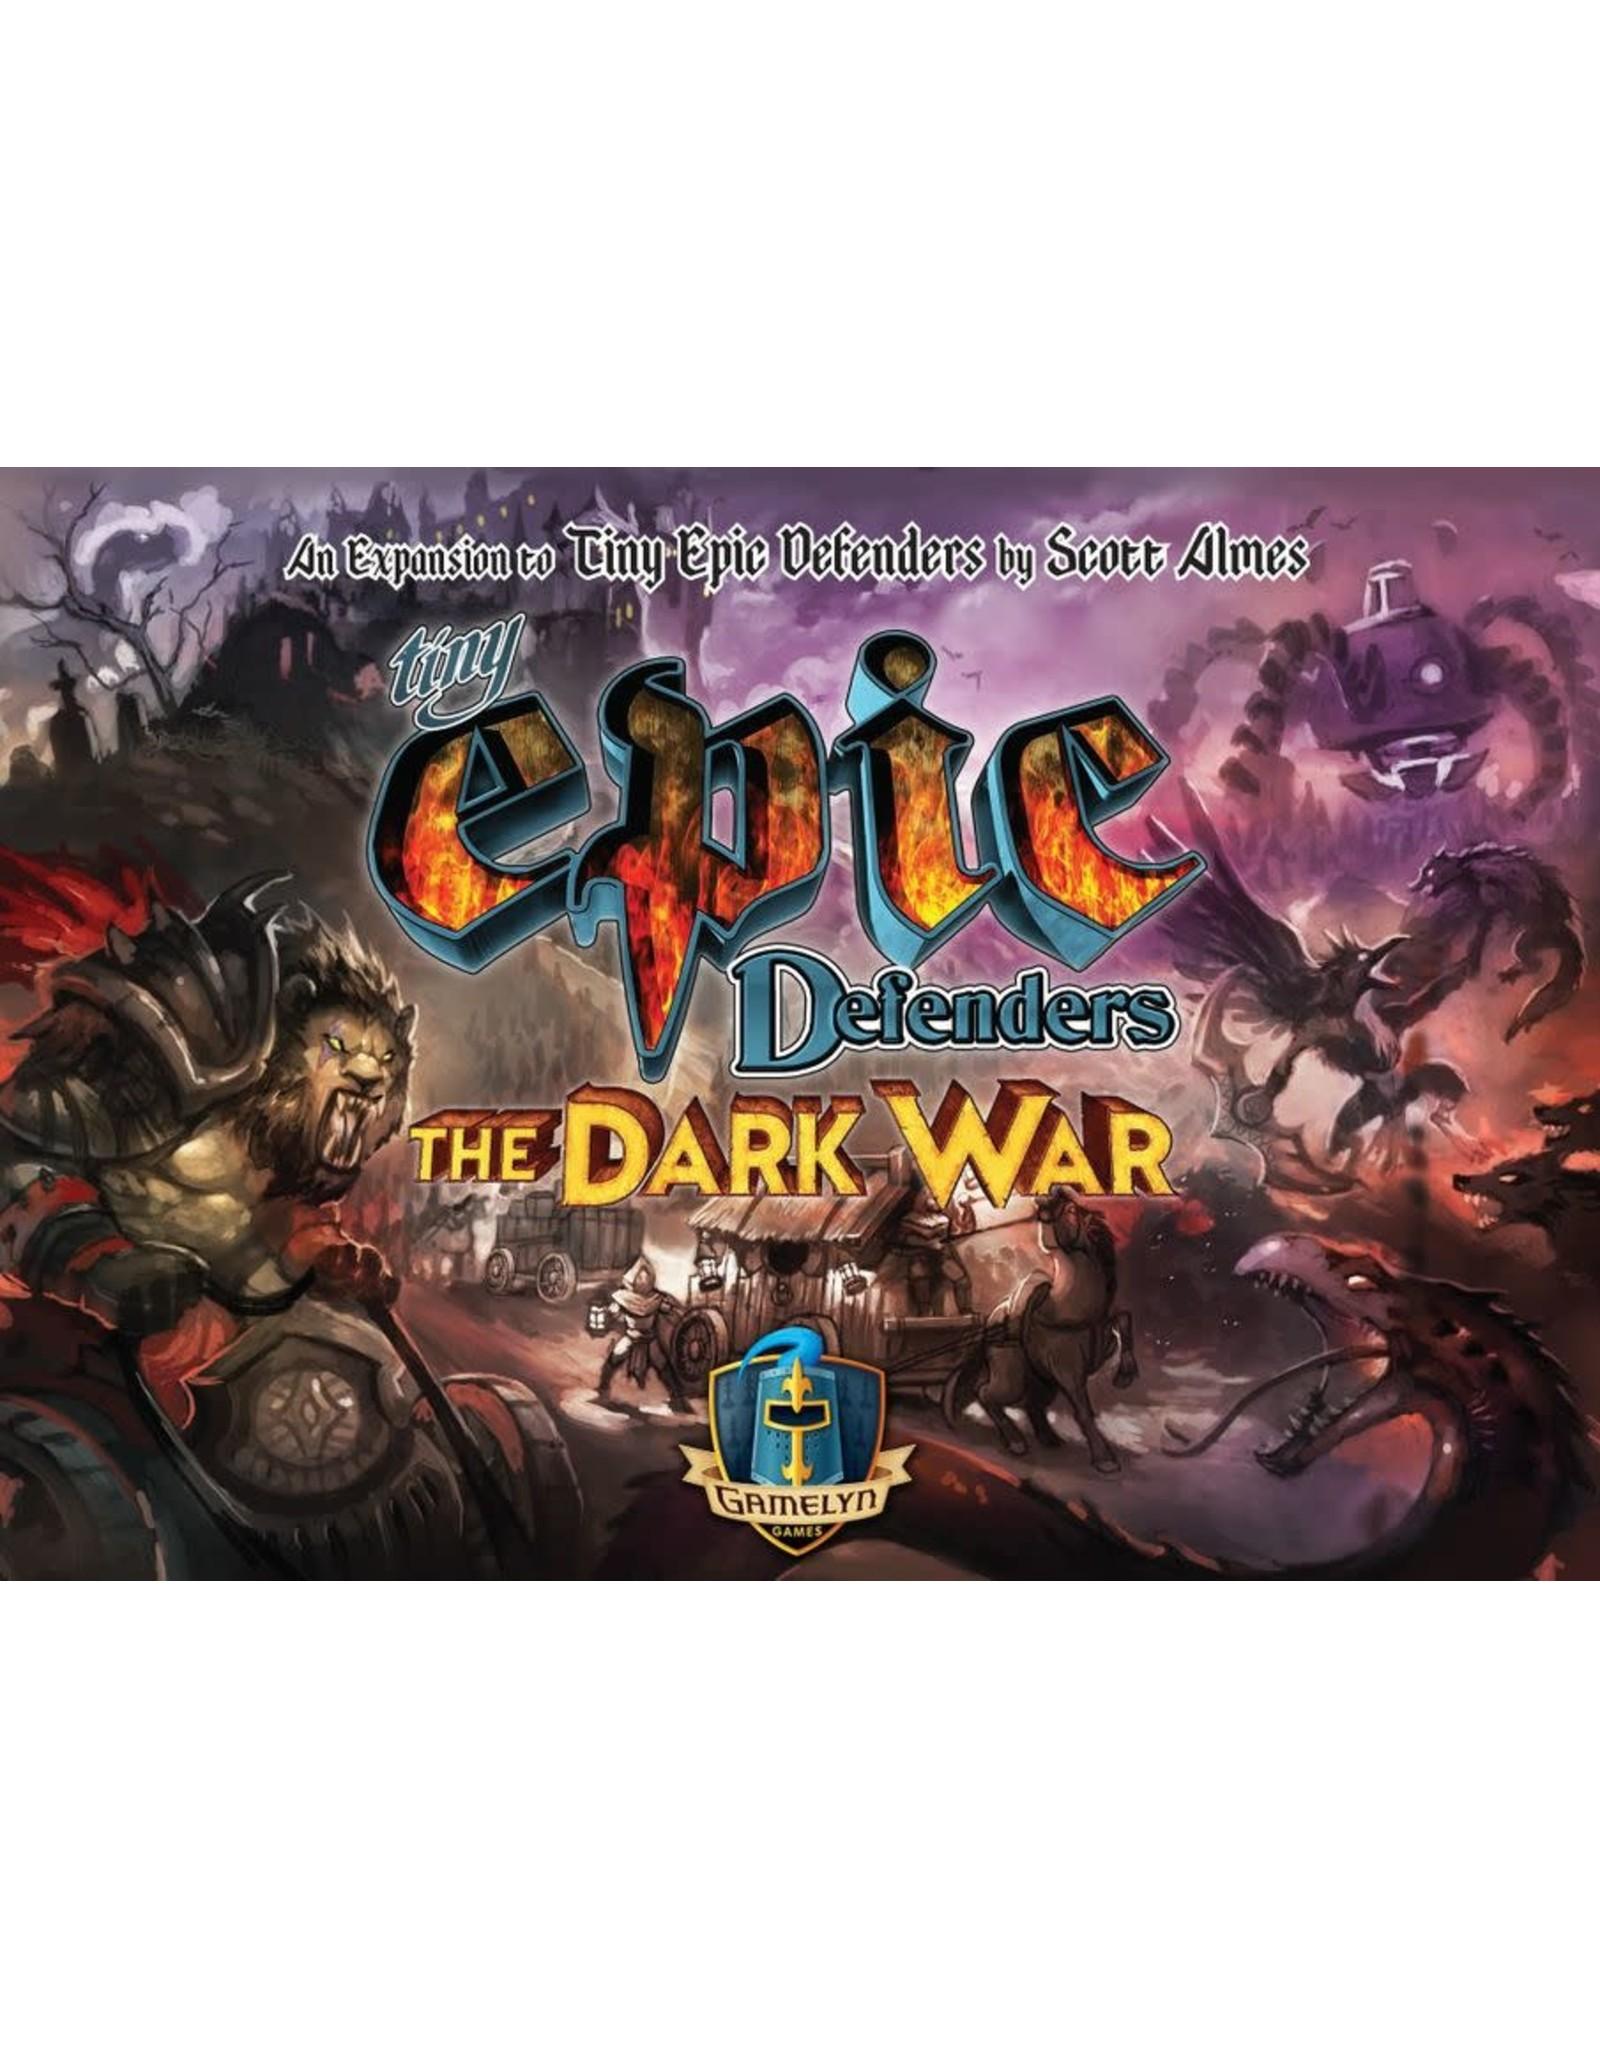 Gamelyn Tiny Epic Defenders The Dark War